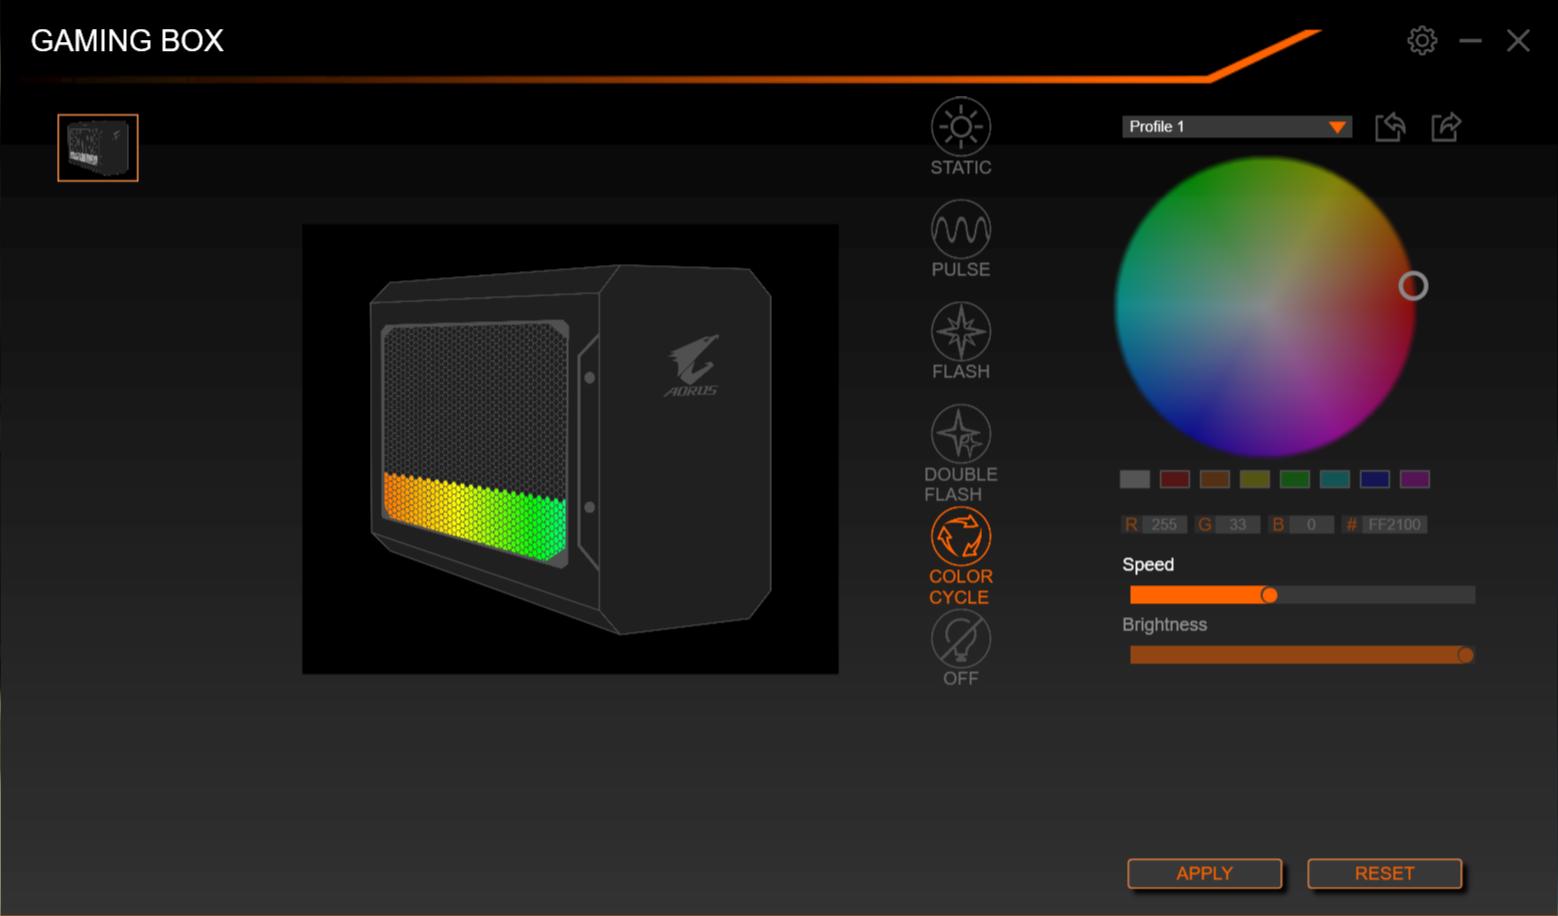 RGB FUSION 2.0截图.png